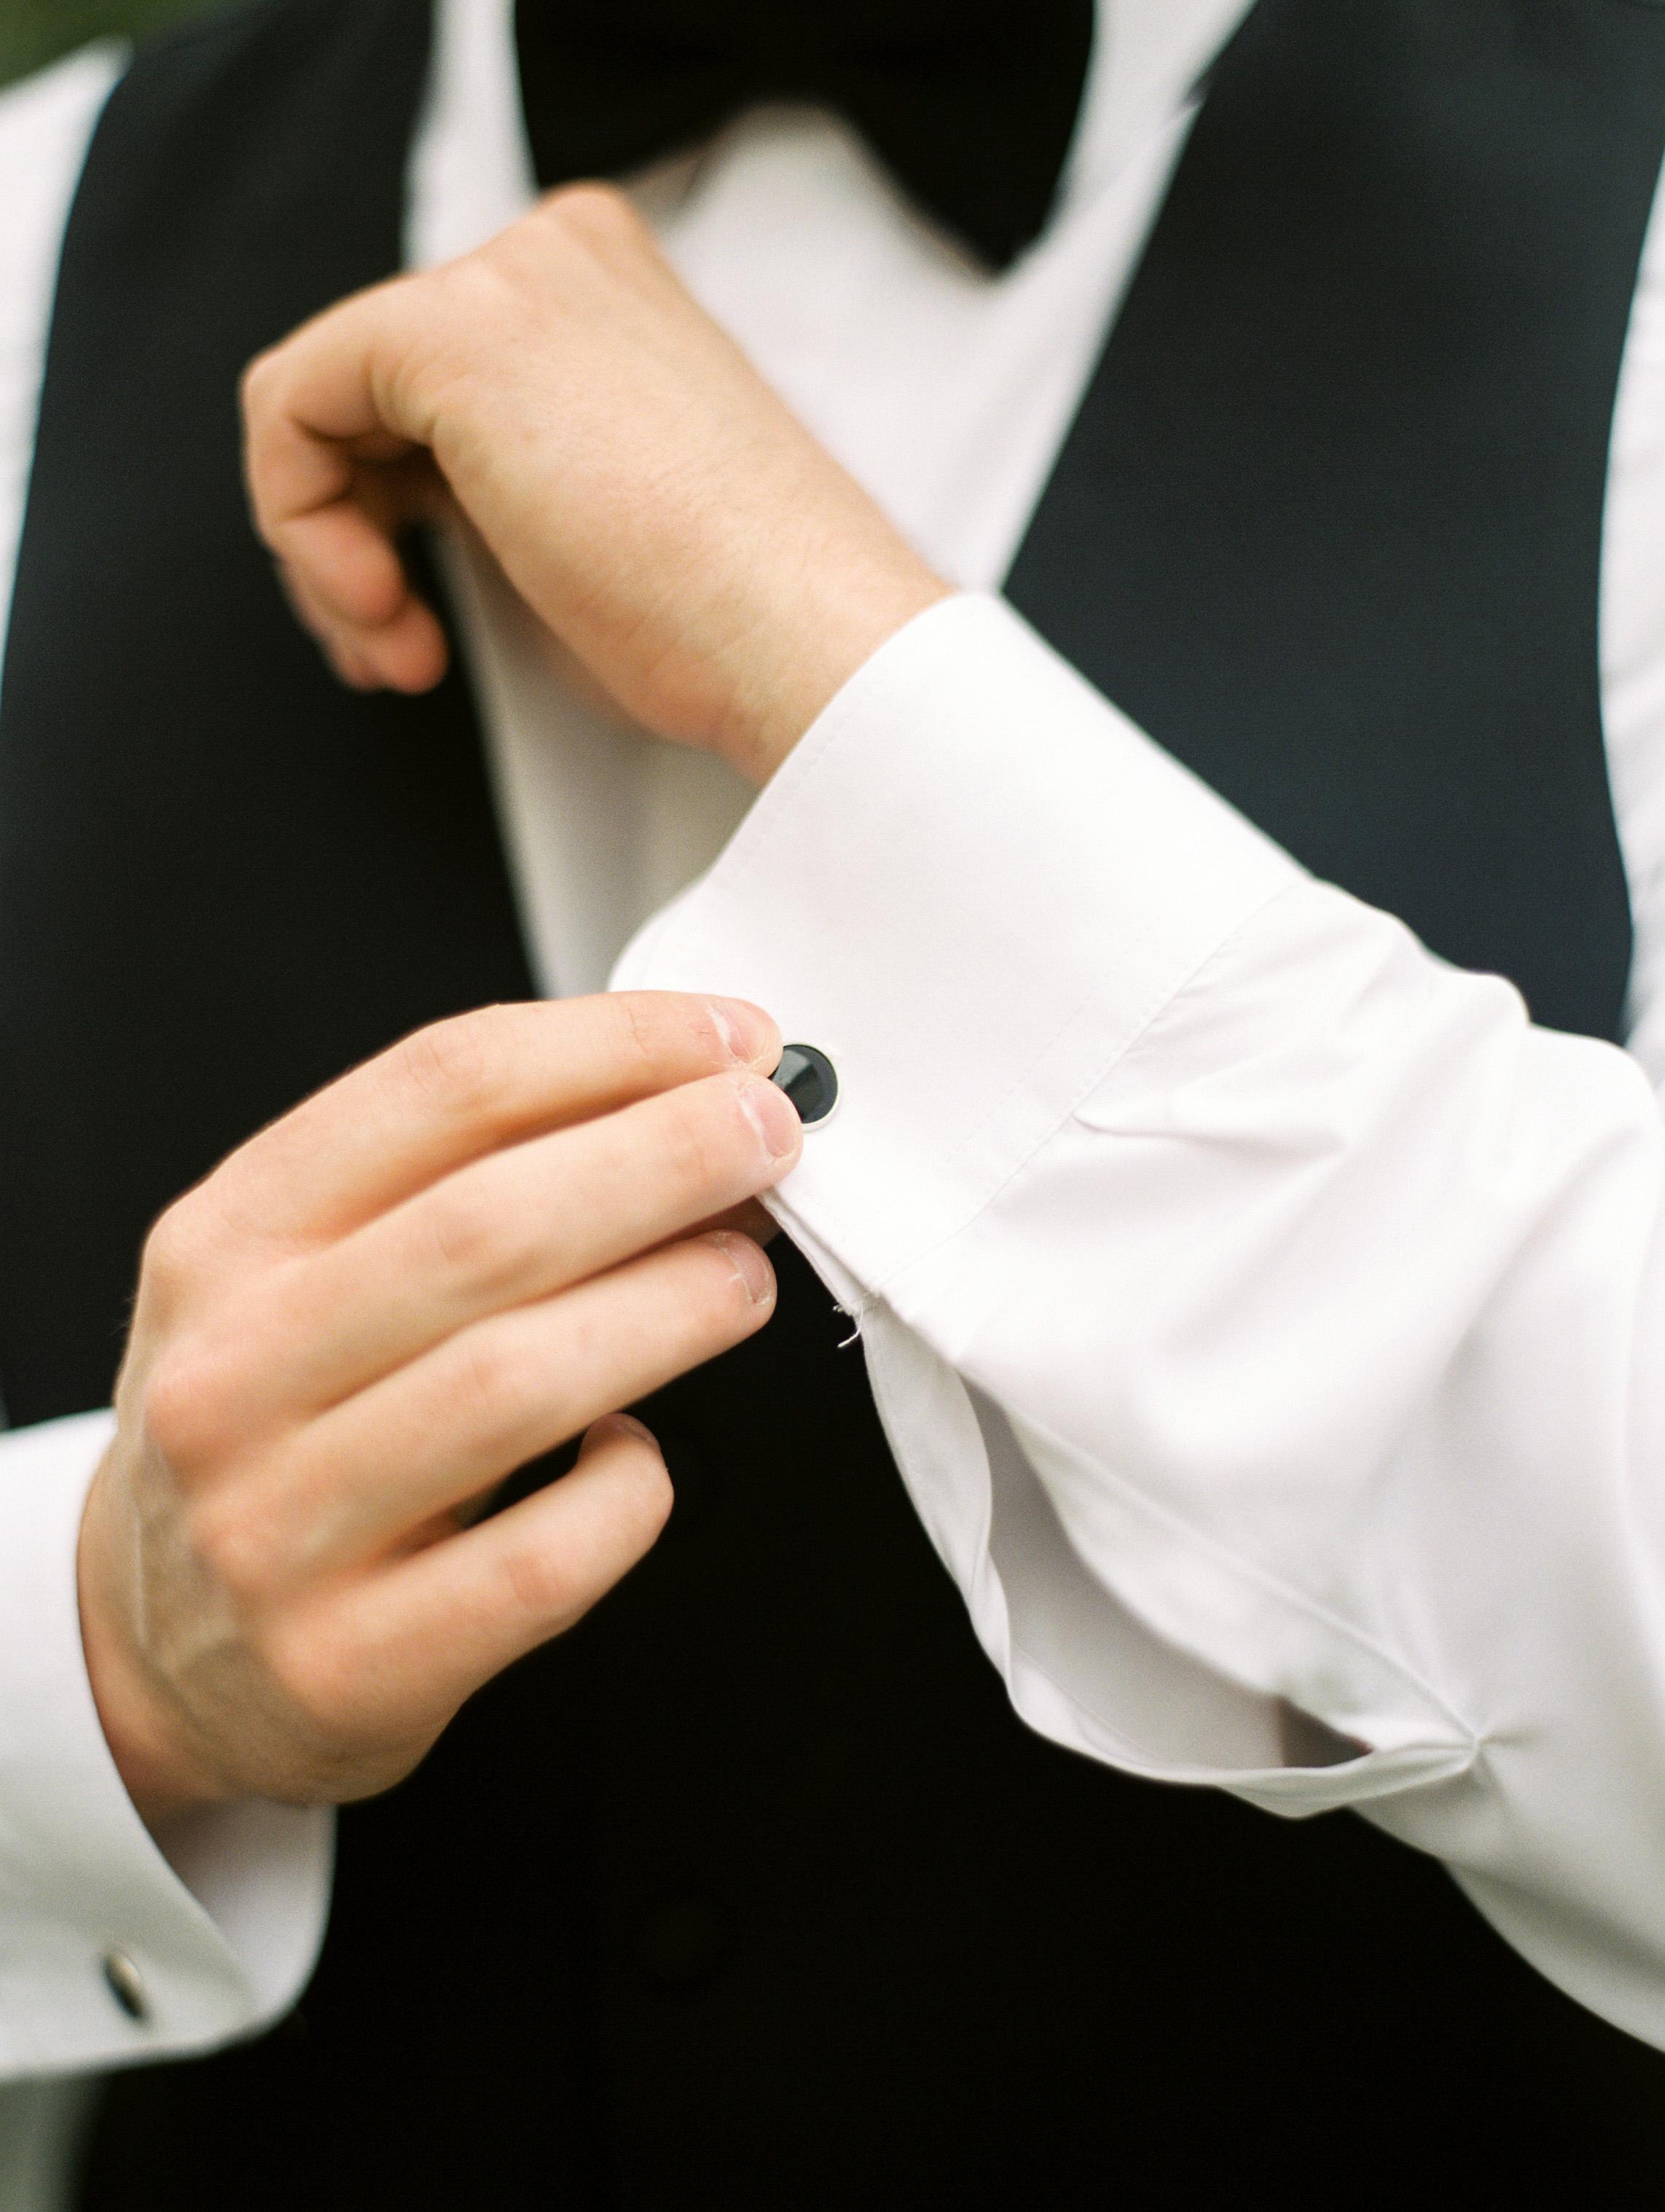 Dana-Fernandez-Photography-Weddings-in-Houston-Magazine-feature-Houston-wedding-photographer-film-15.jpg